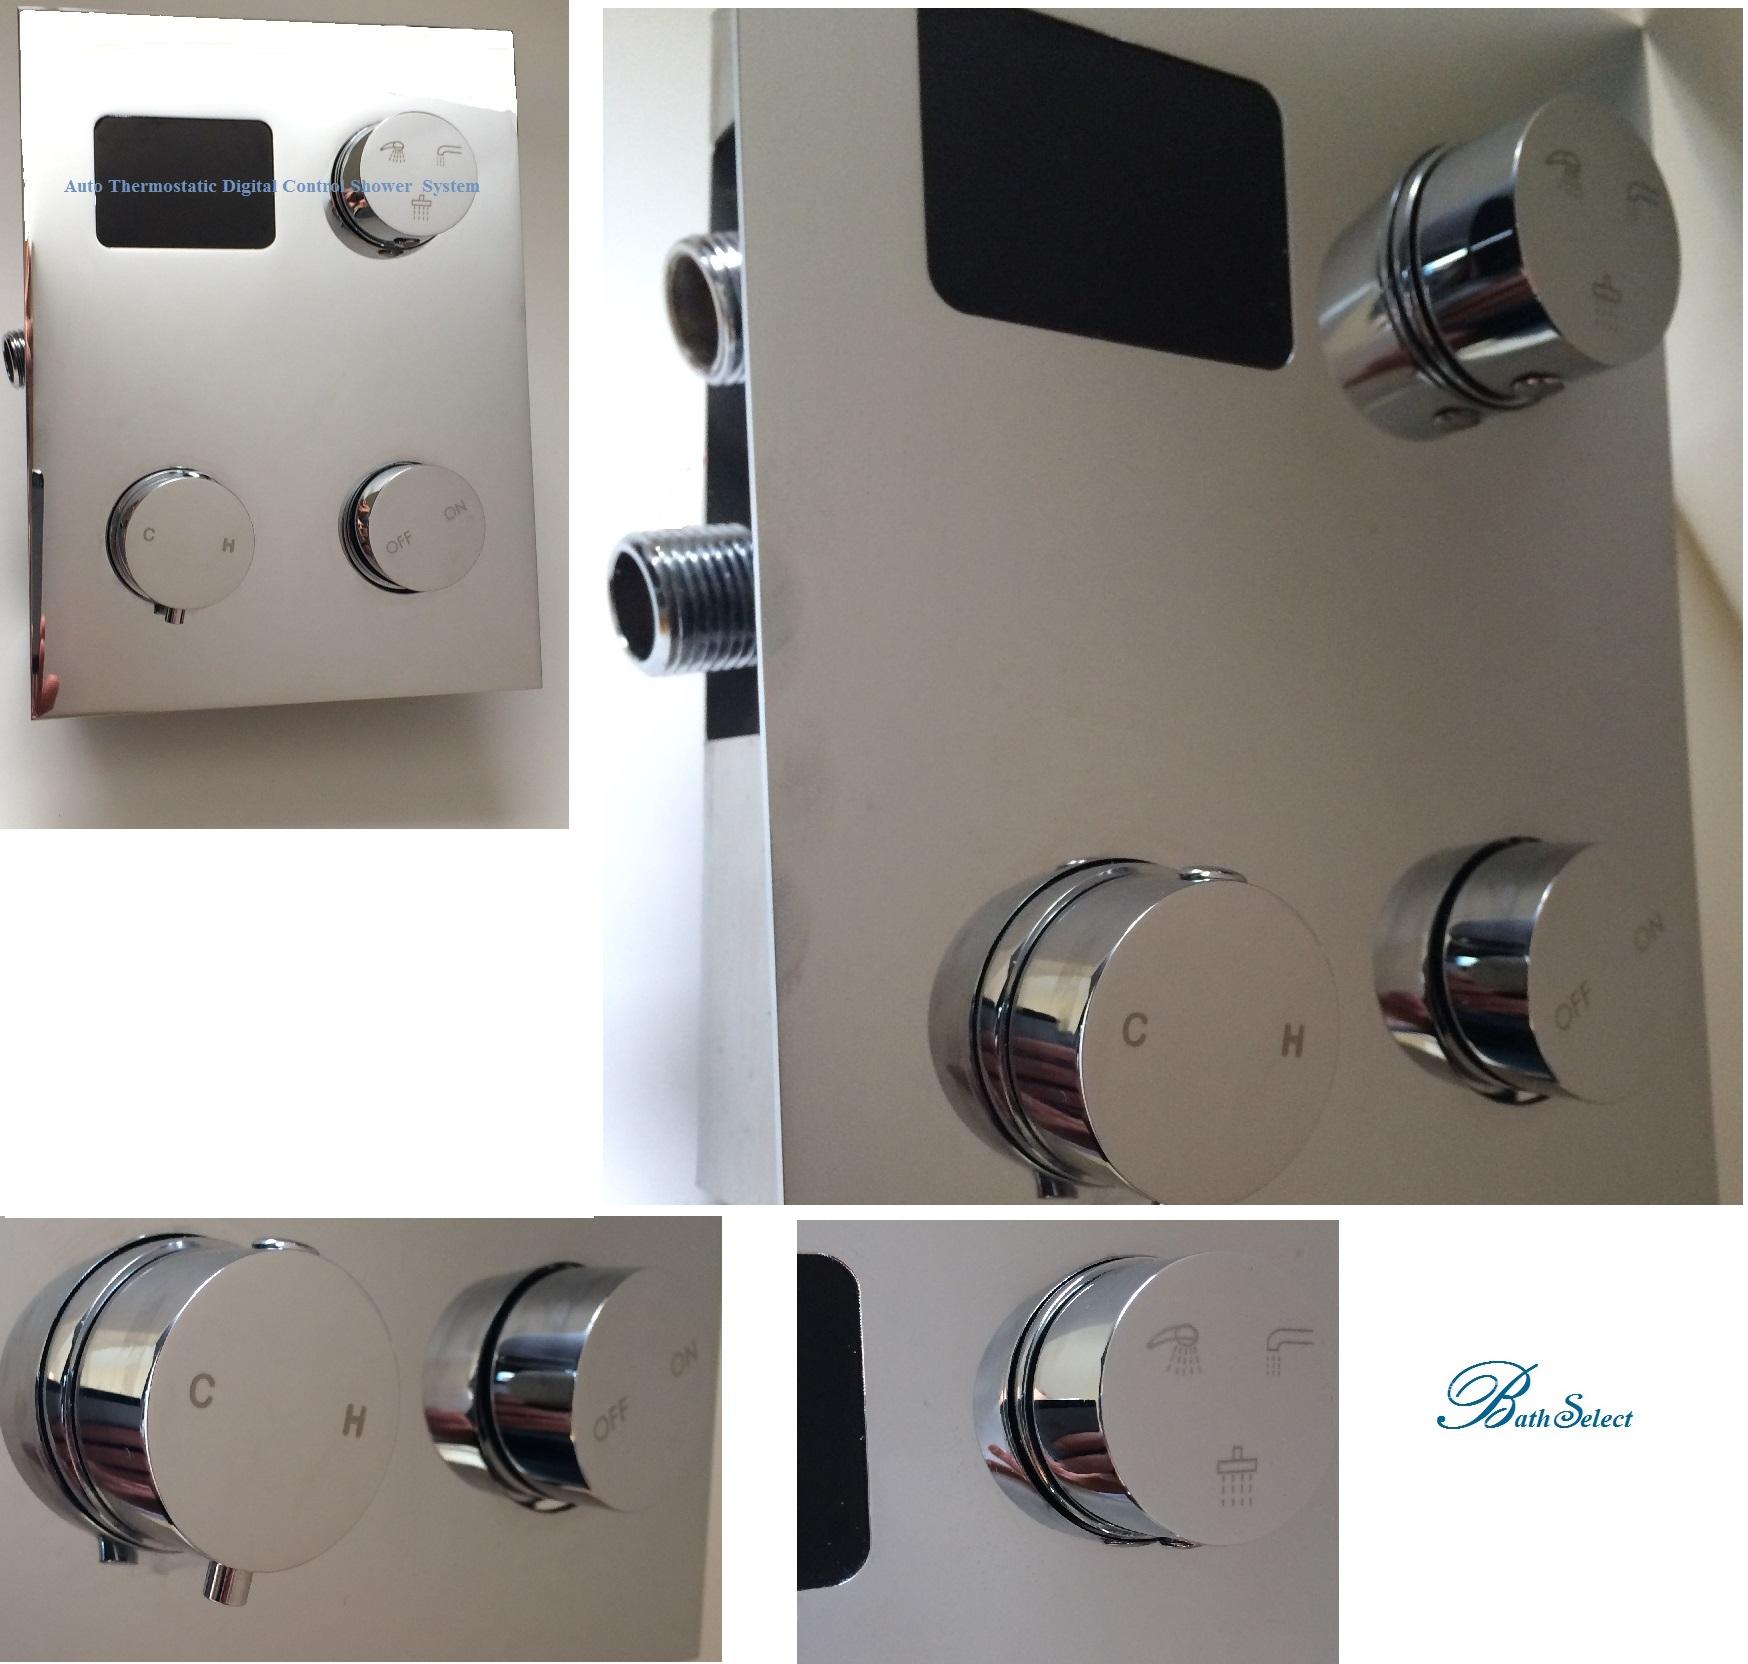 Digital shower temperature control - Digital Display Shower Mixer